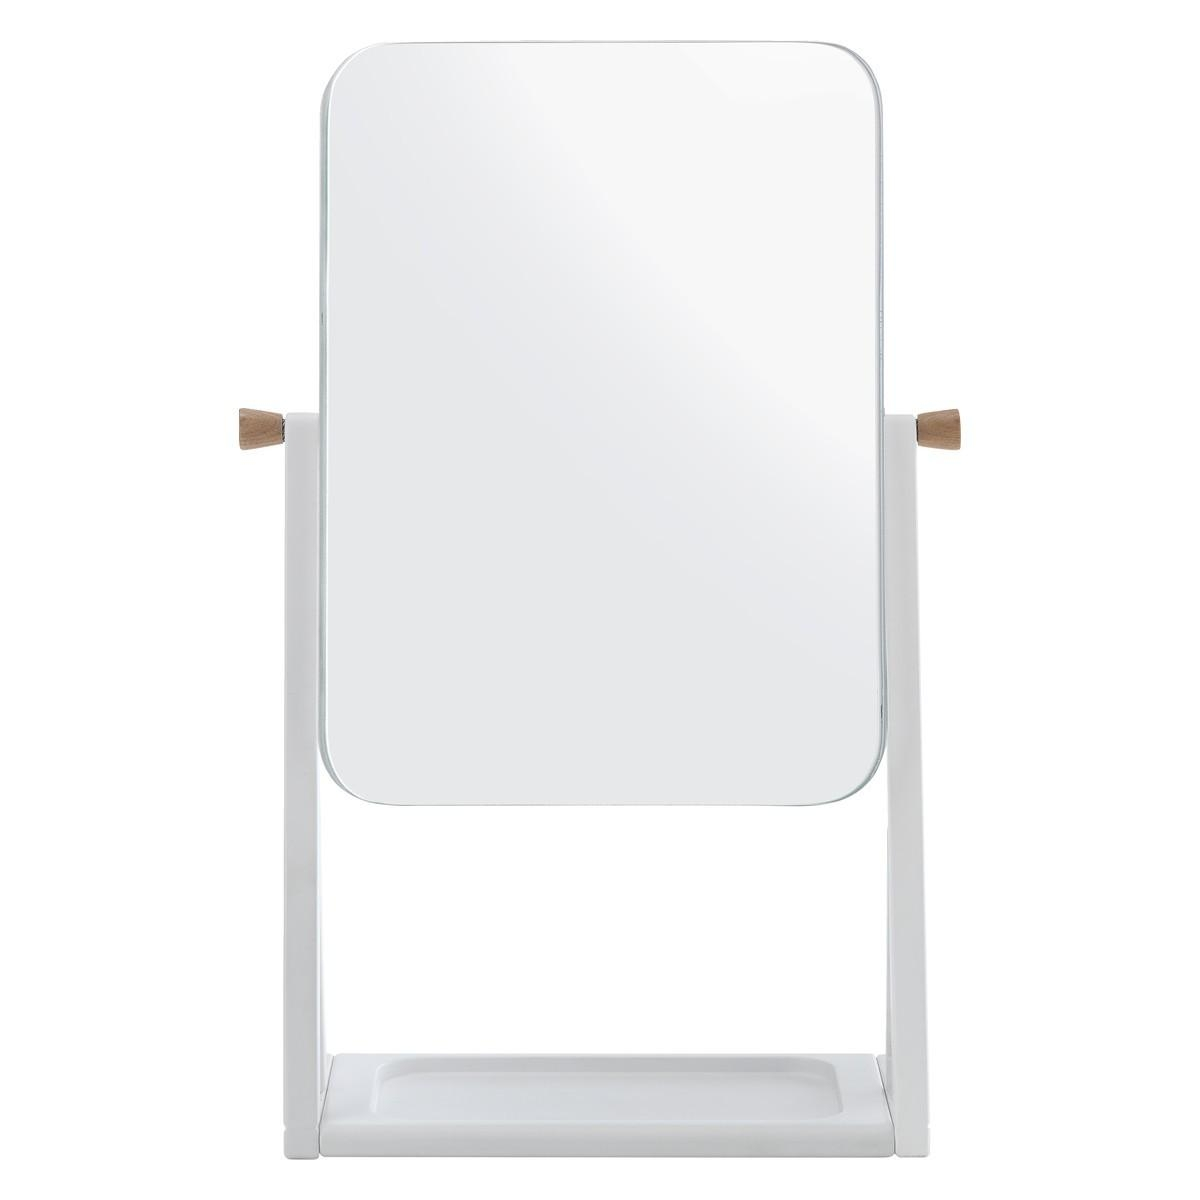 Tatsuma White Dressing Table Mirror | Buy Now At Habitat Uk Within Dressing Table Mirrors (Image 16 of 20)